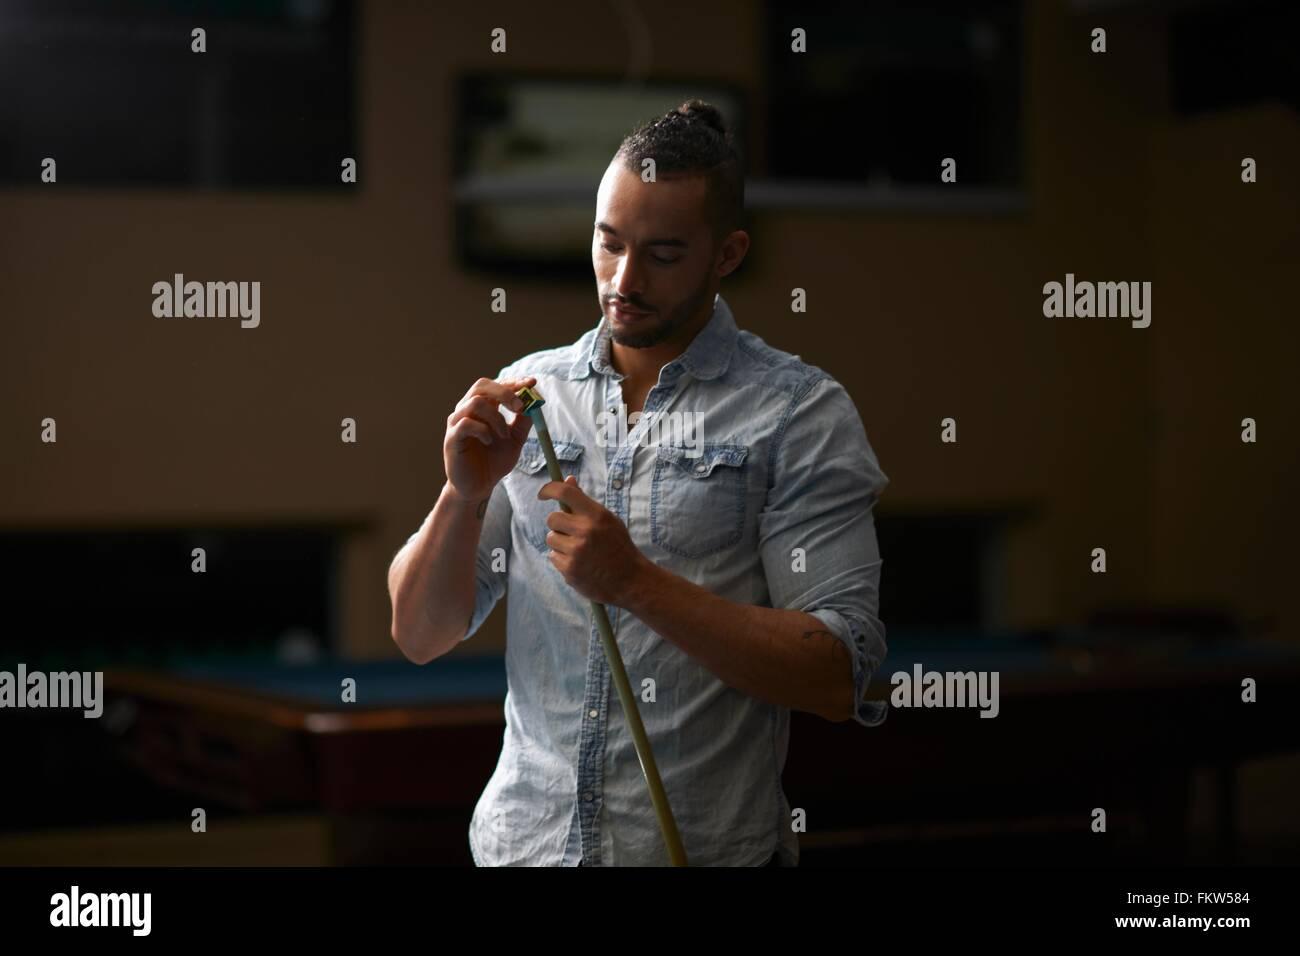 Man chalk rubbing pool cue - Stock Image